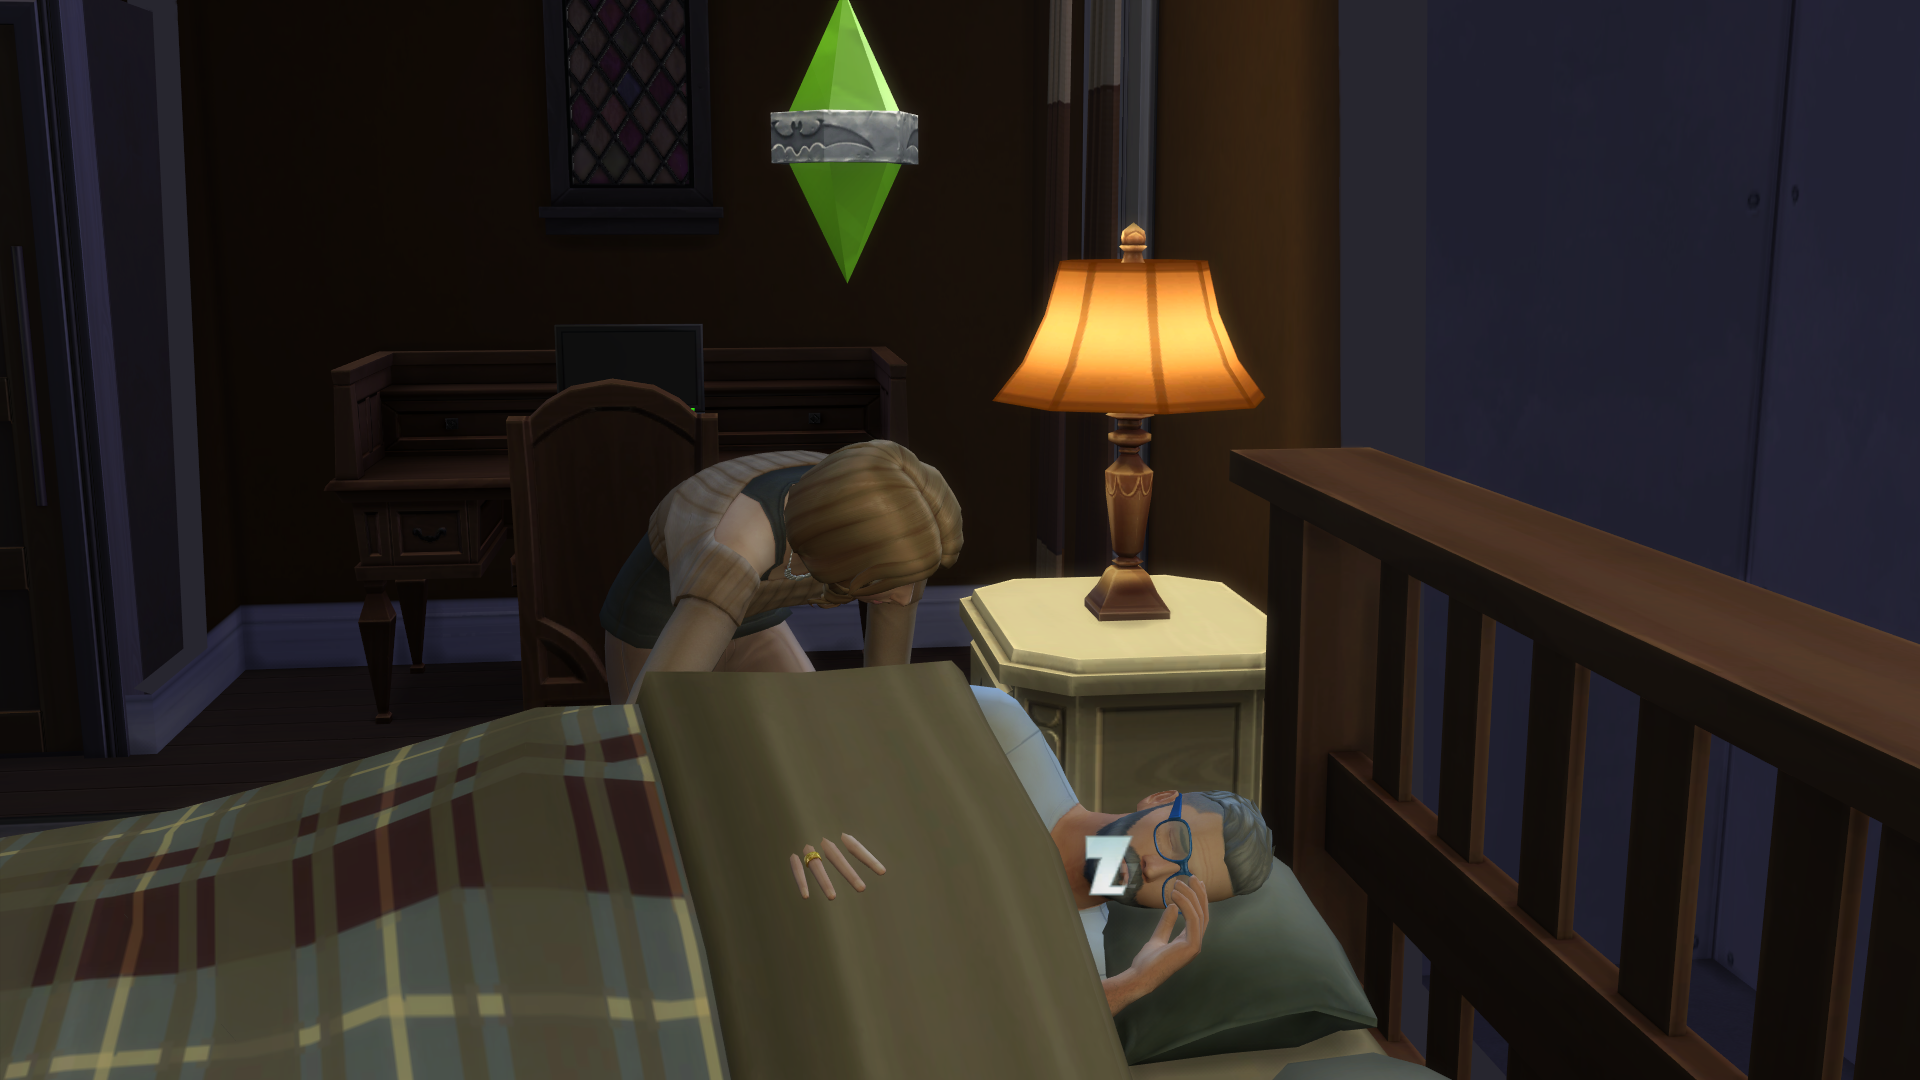 Мод Заправка кровати для всех возрастов